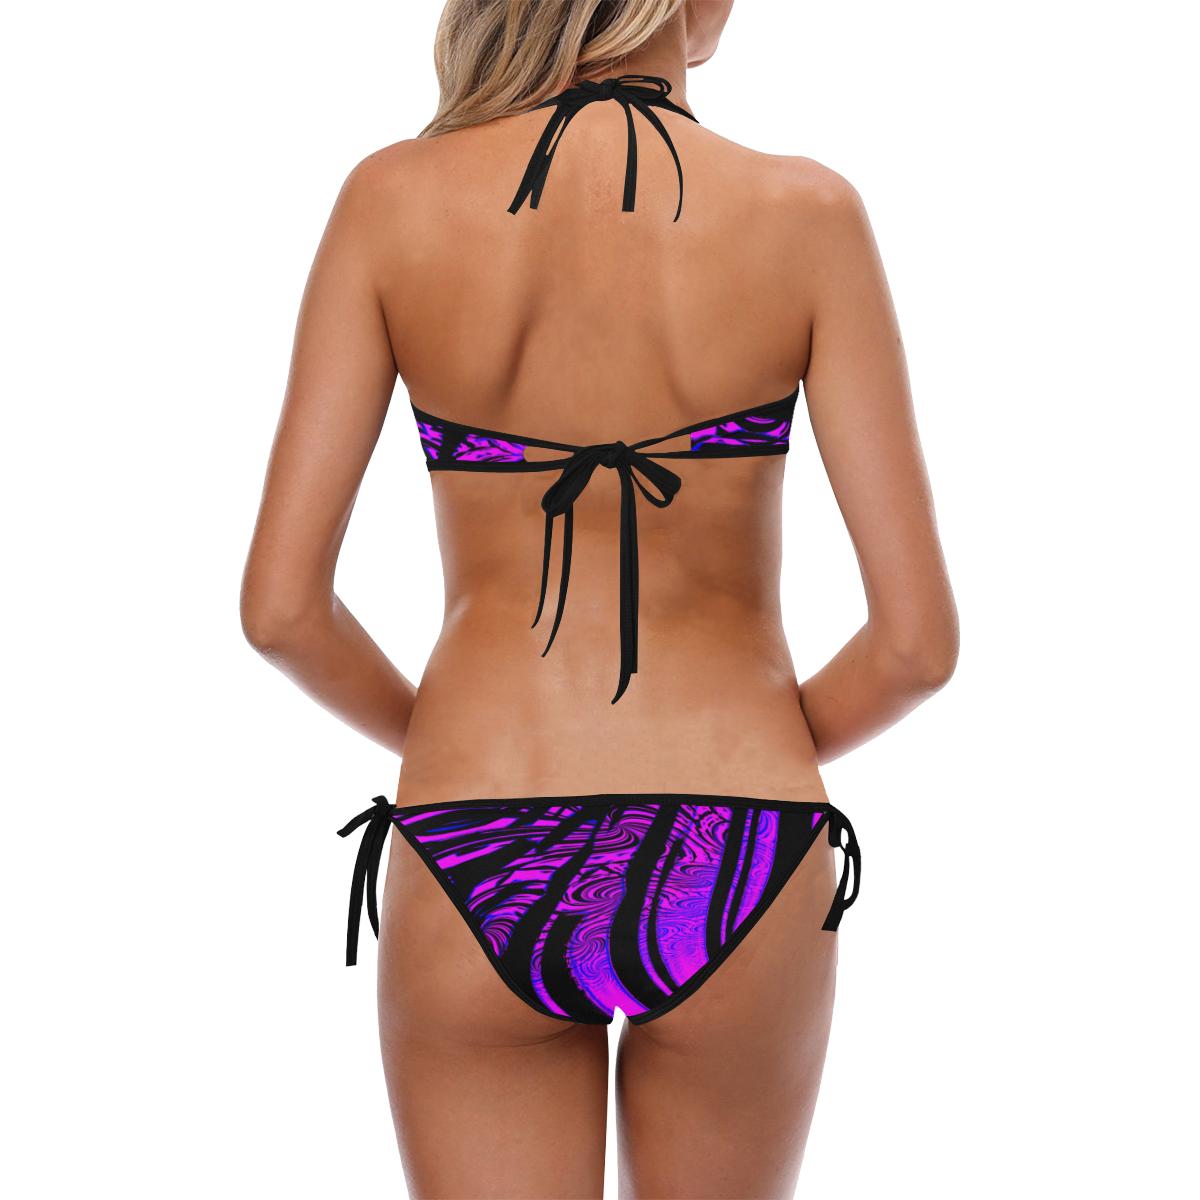 Dance Party Custom Halter & Side Tie Bikini Swimsuit (Model S06)